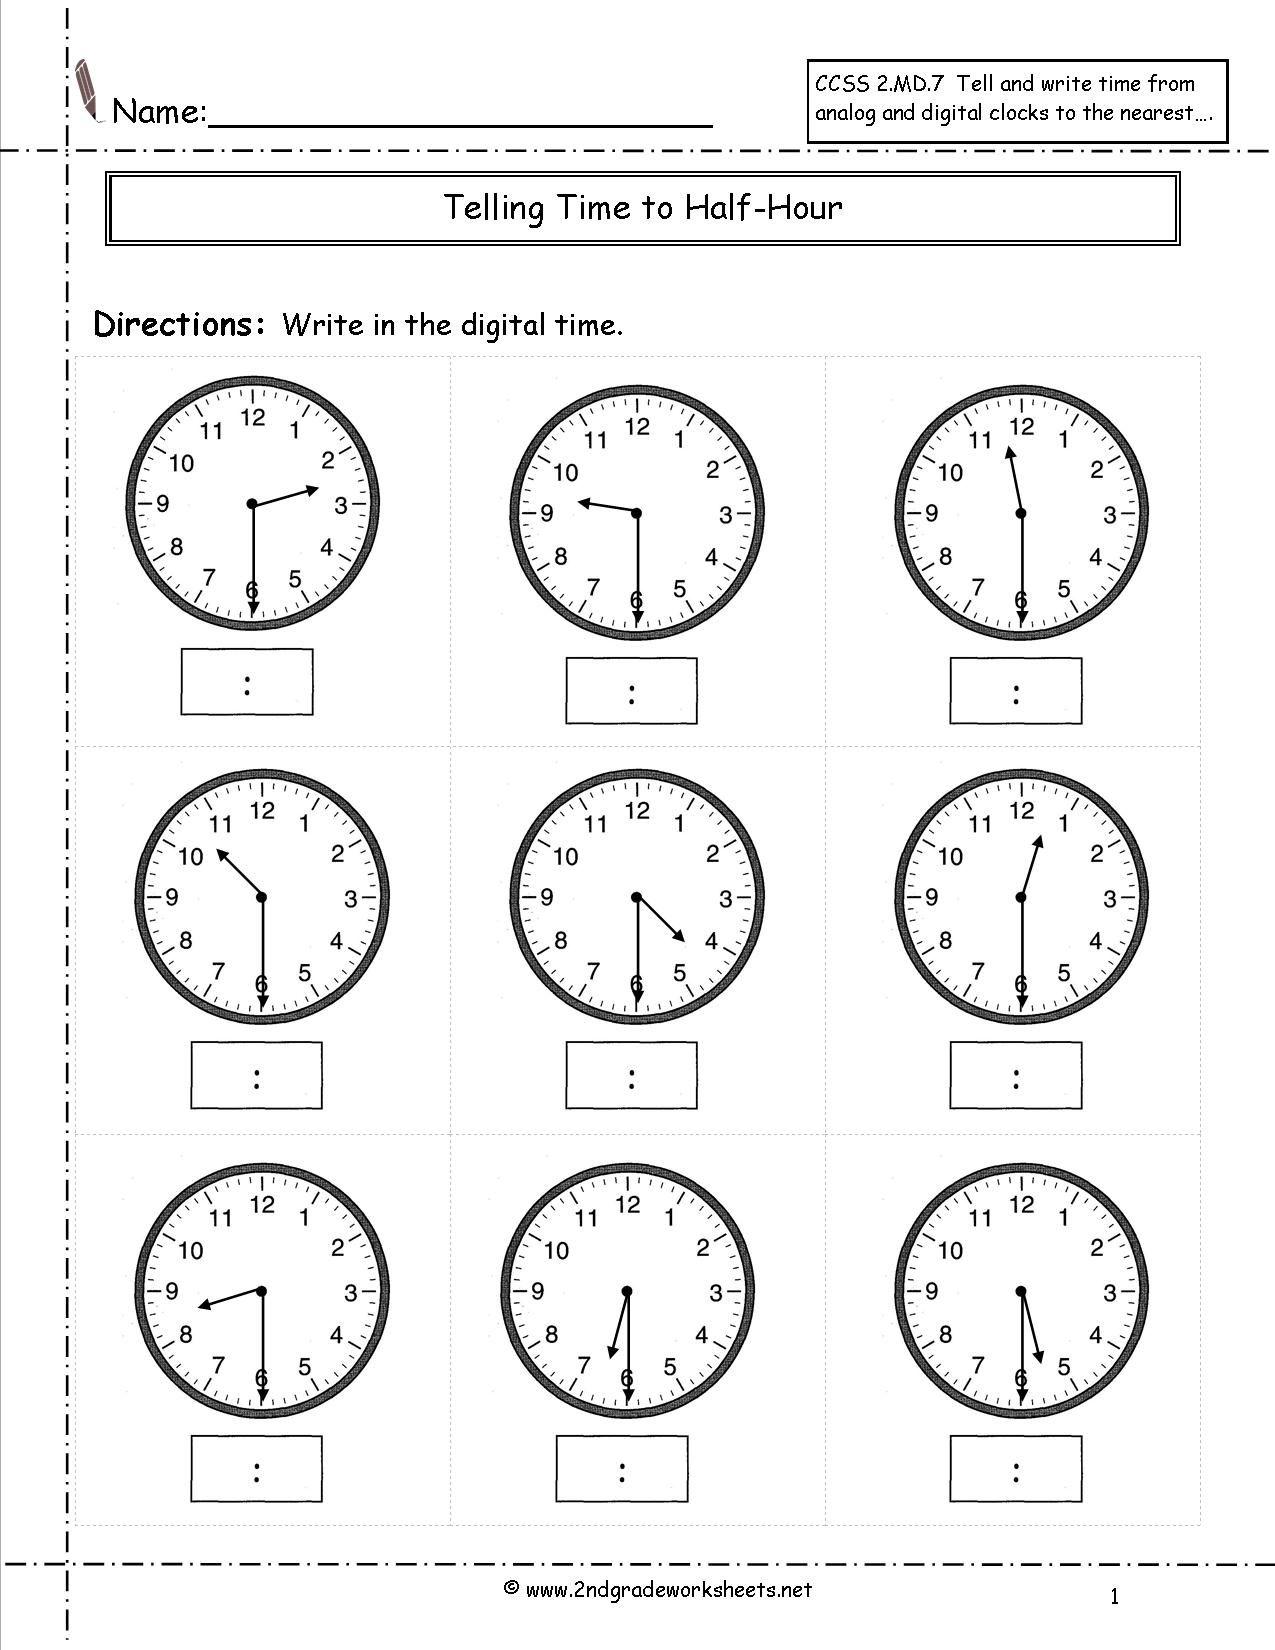 2ndgradeworksheets Tellingtime Timetohalfhour